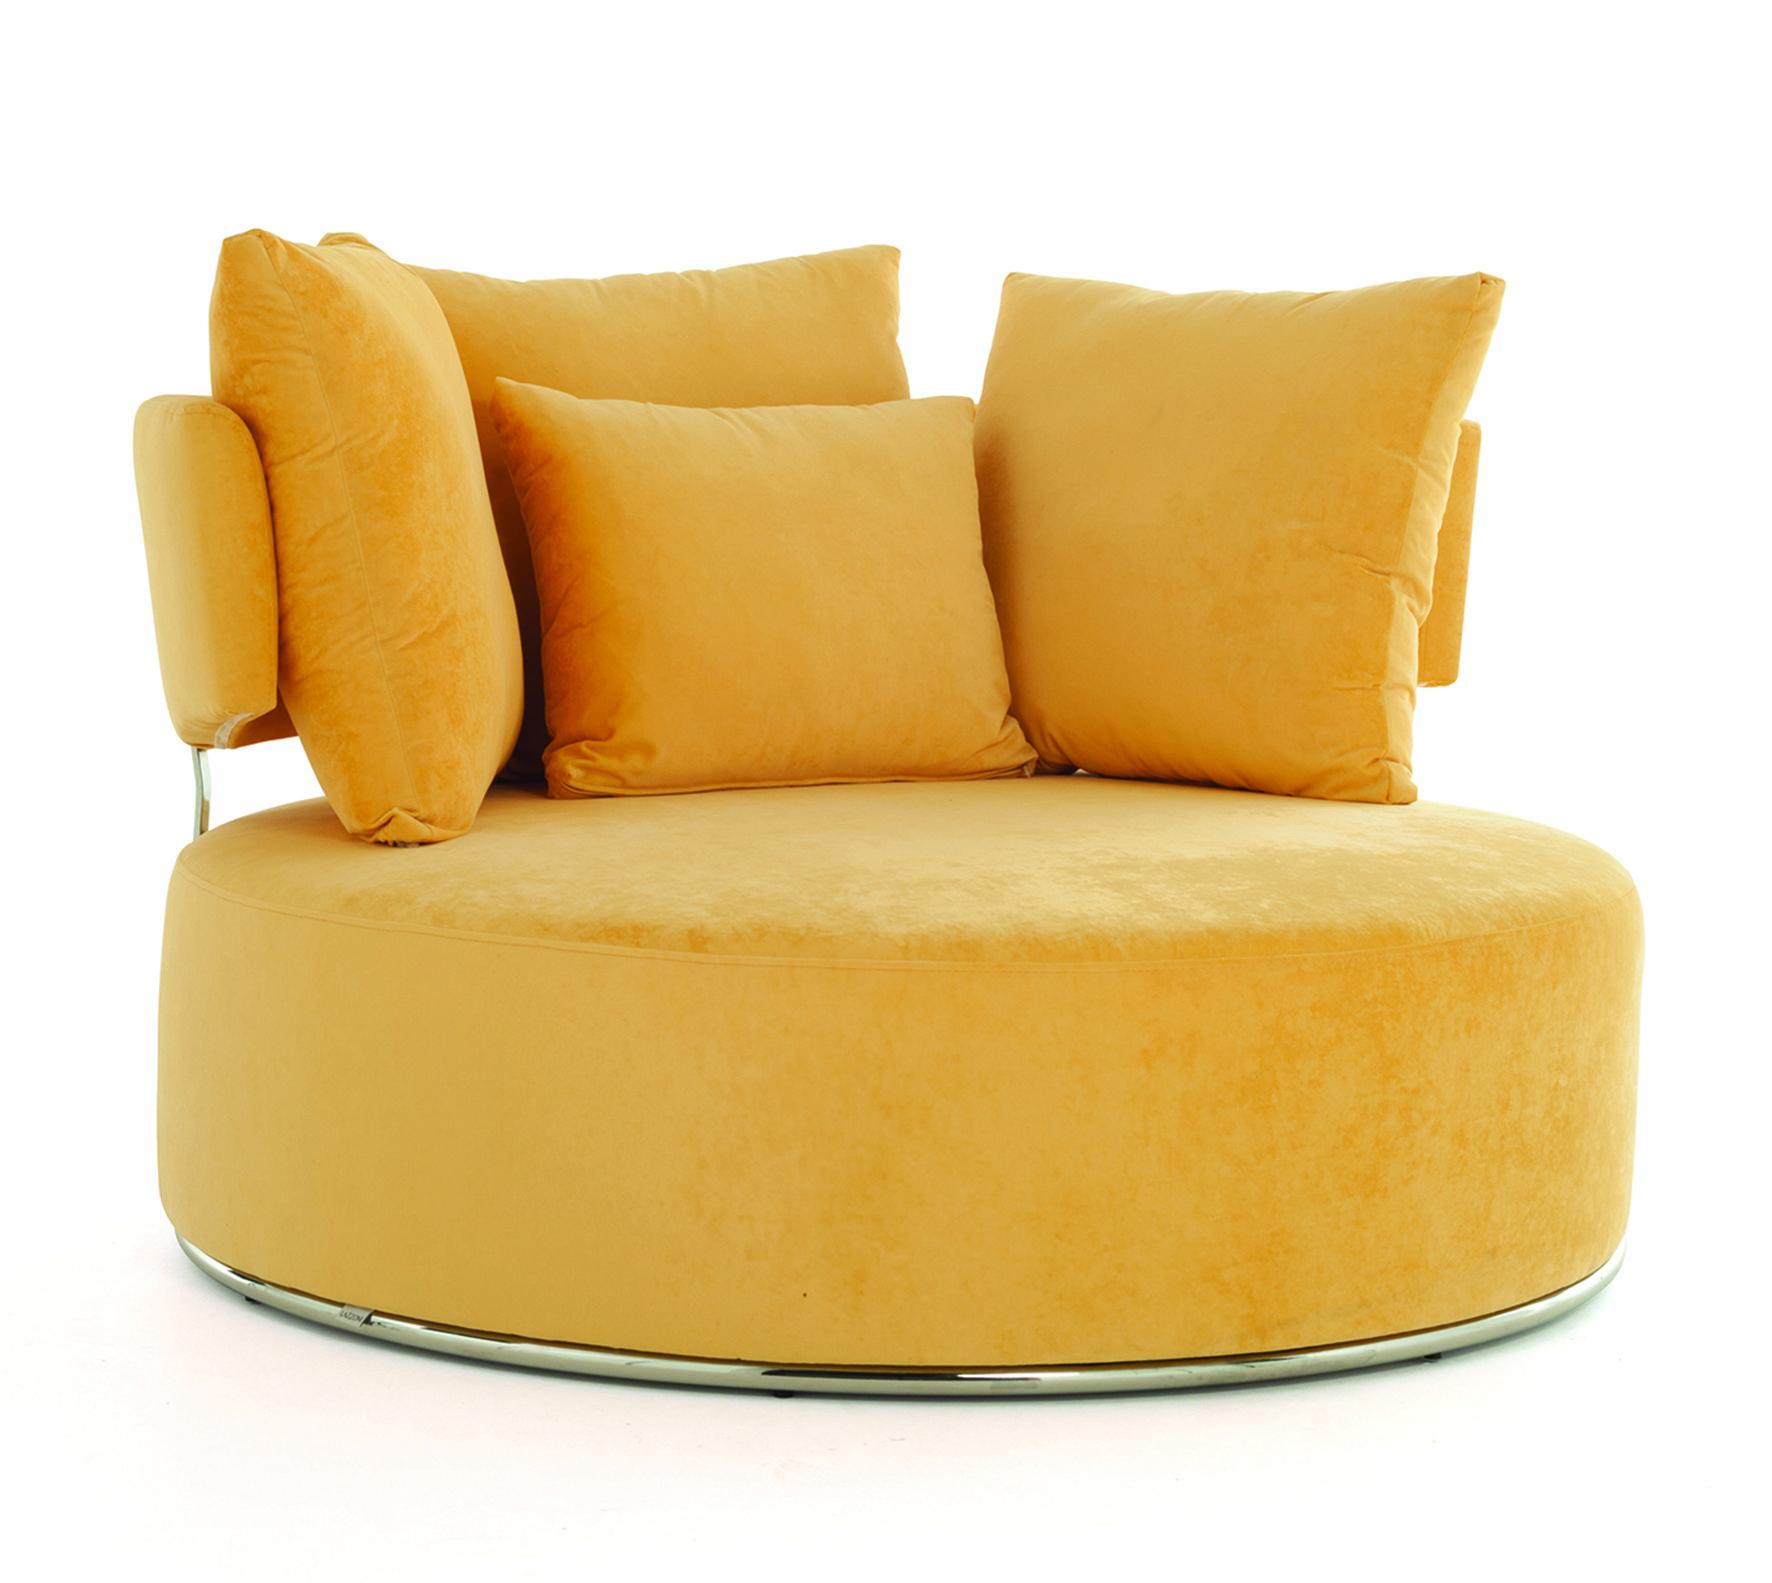 Http Www Lazzoni Com Tr Urunler Oturma Koltuk Eva Lazzoni Furniture Round Sofa Furniture